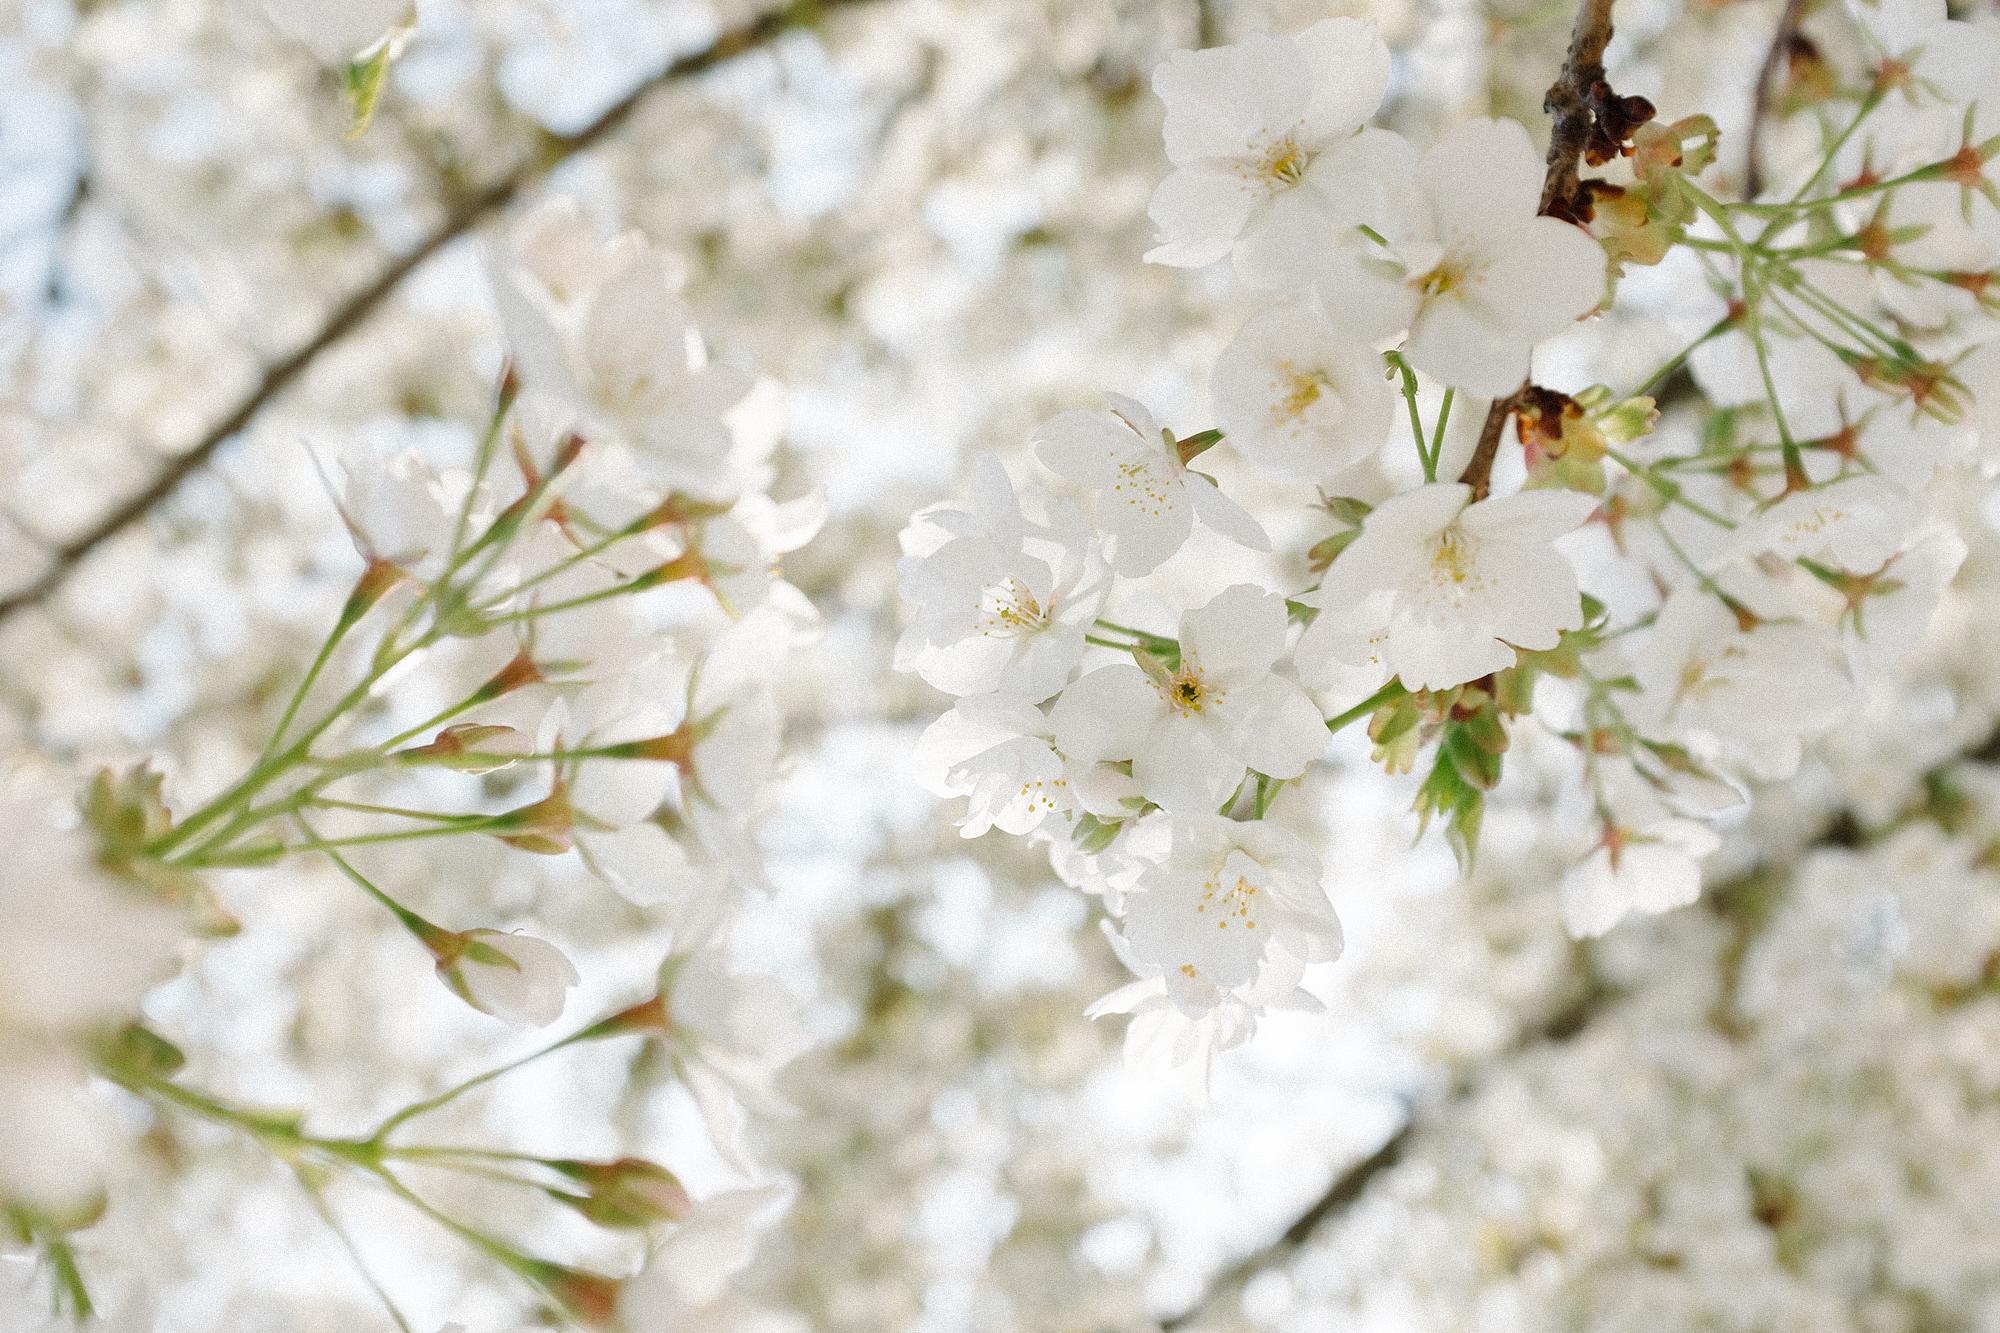 Spring_Paris_CarinOlsson03.jpg